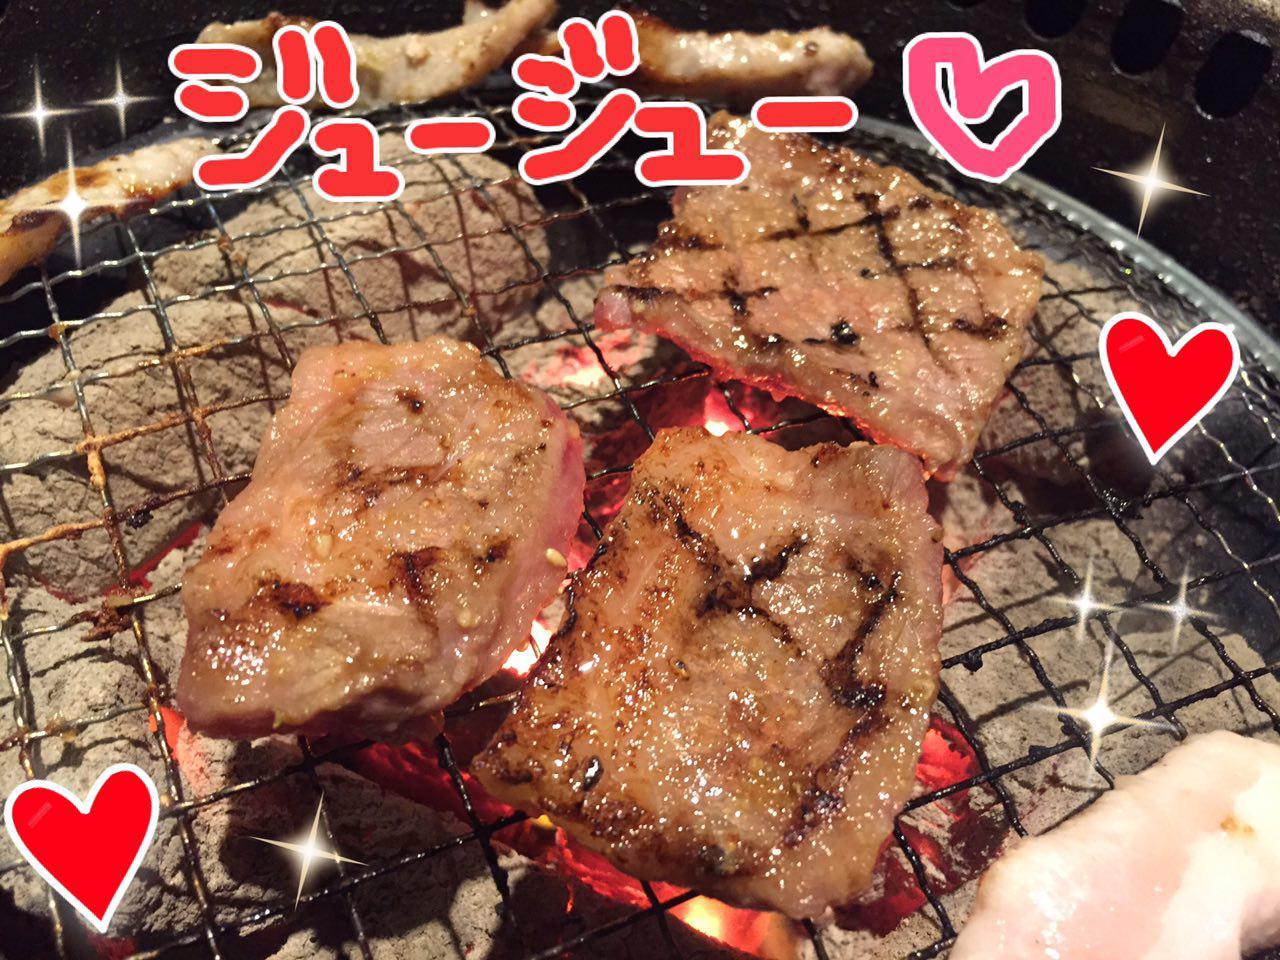 photo_2017-04-23_00-46-45.jpg